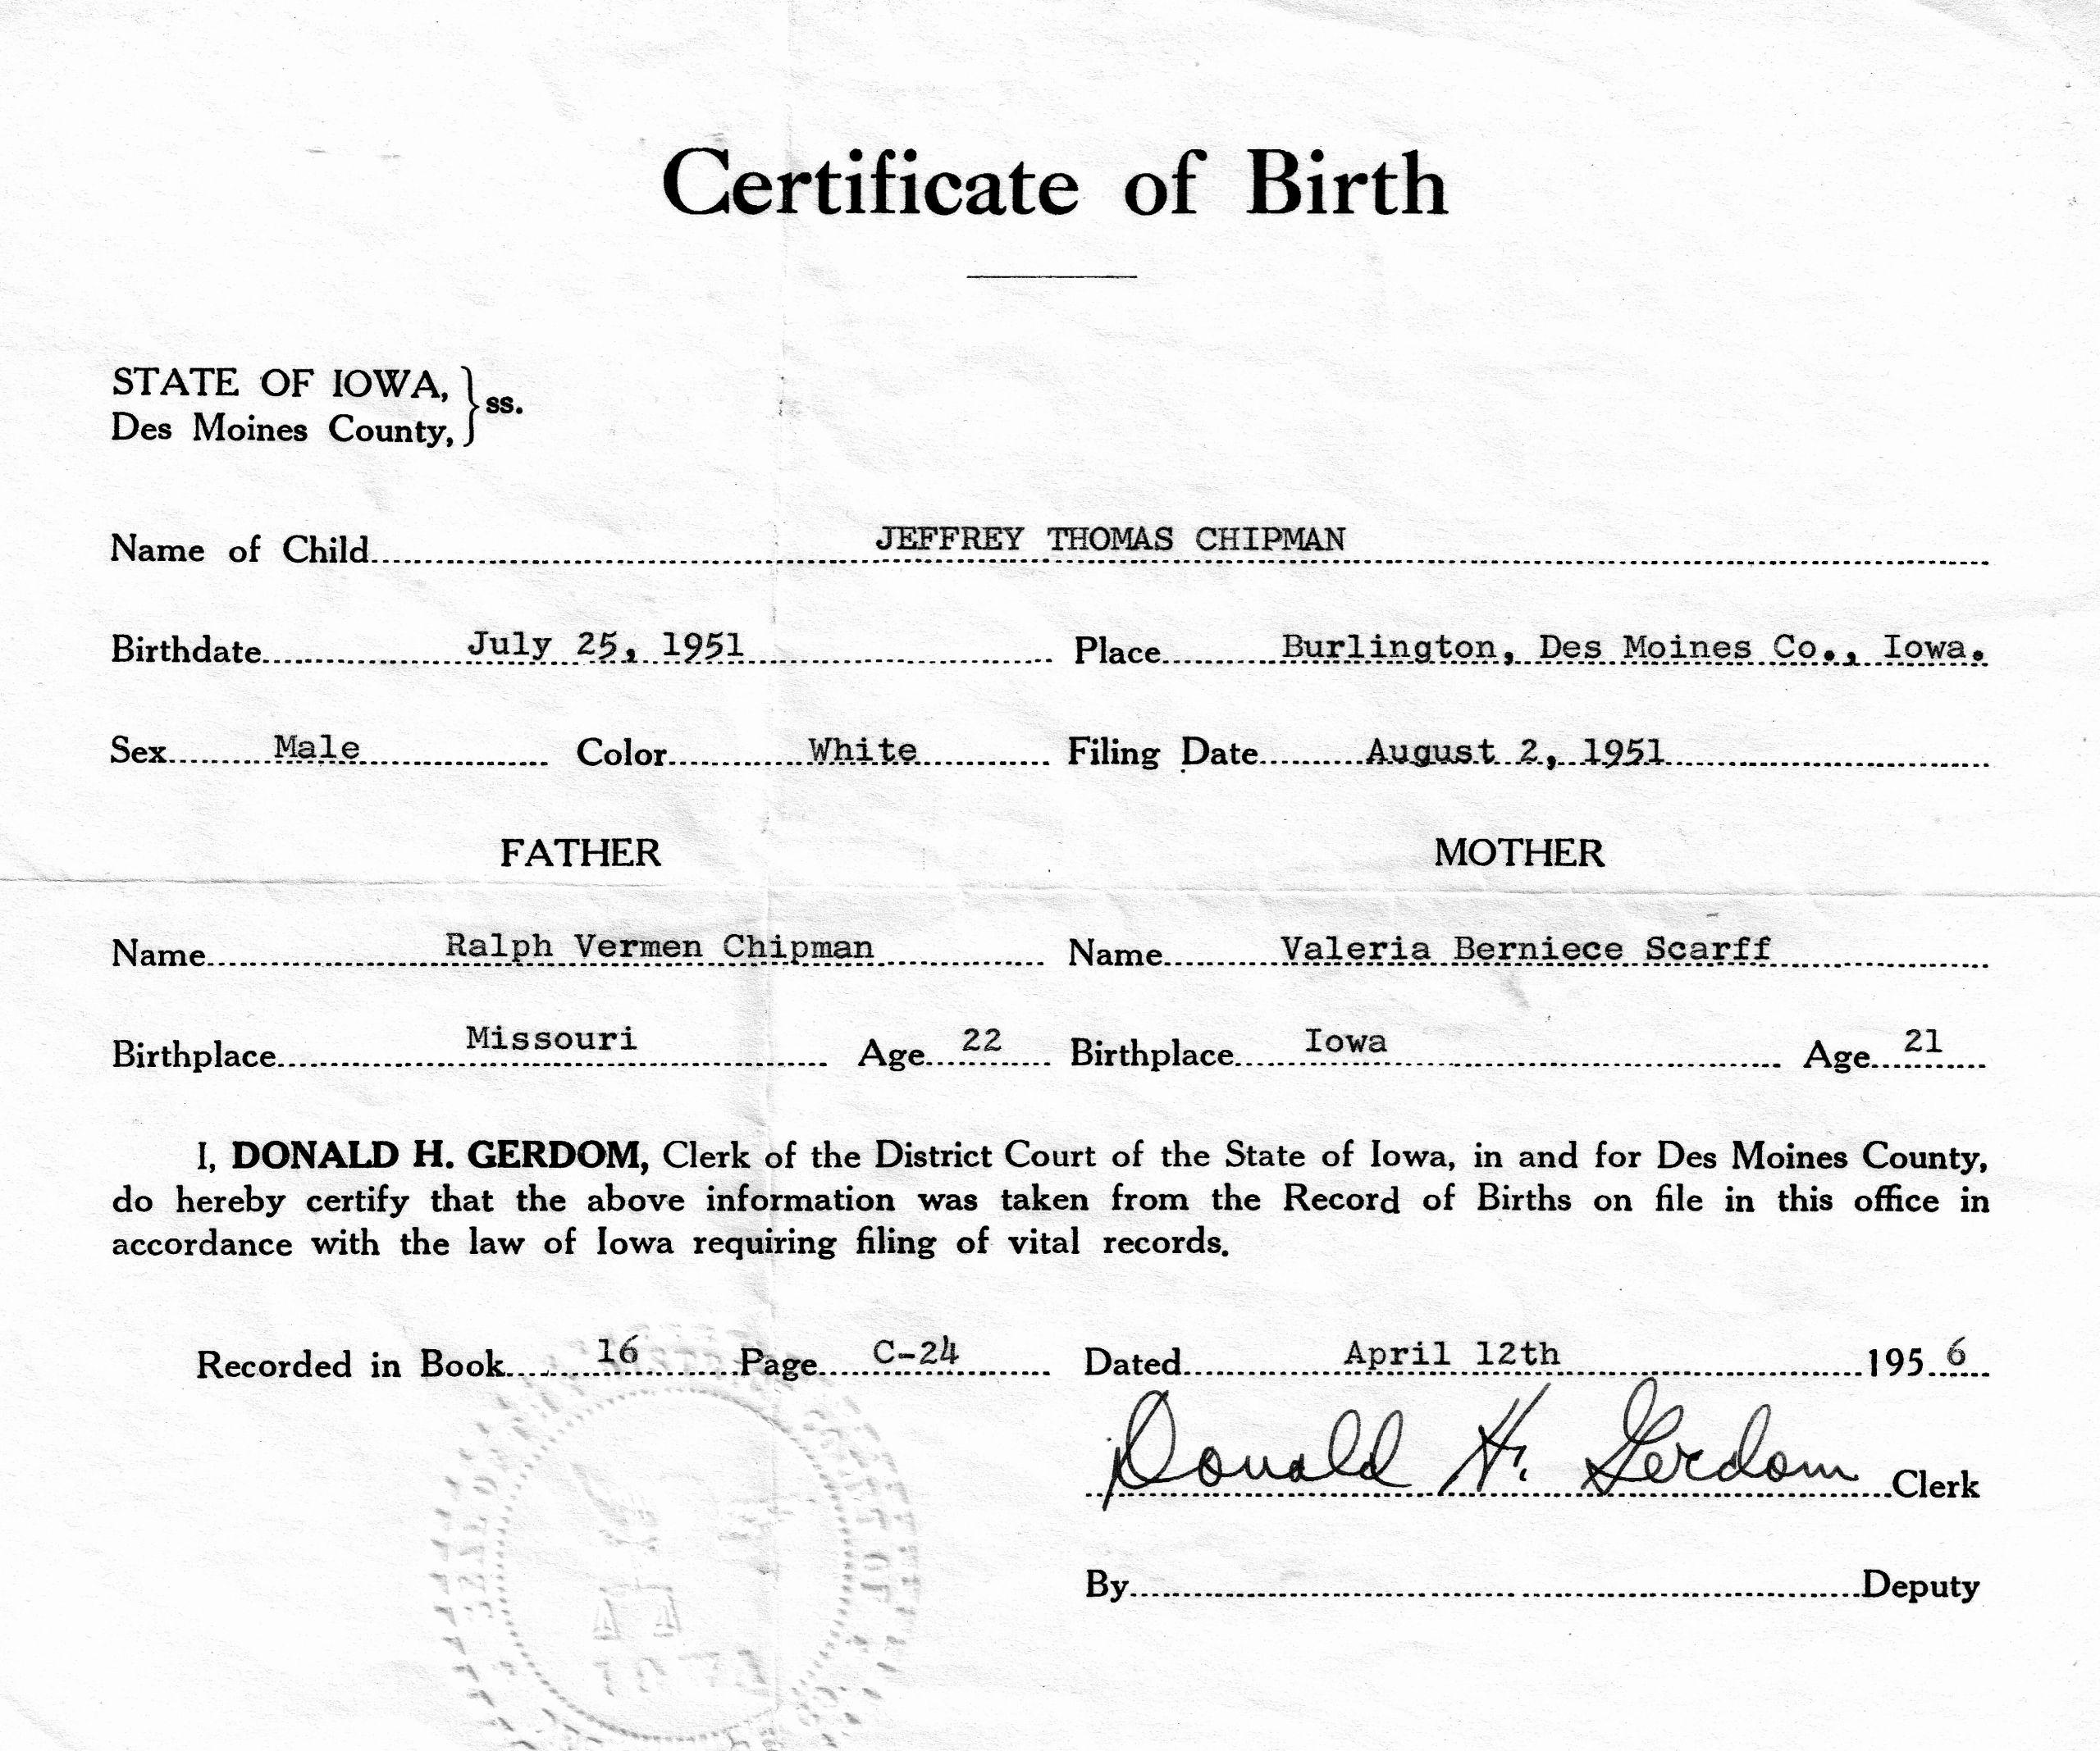 Birth Certificate Template Doc Beautiful 21 Free Birth Certificate Template Word Excel formats